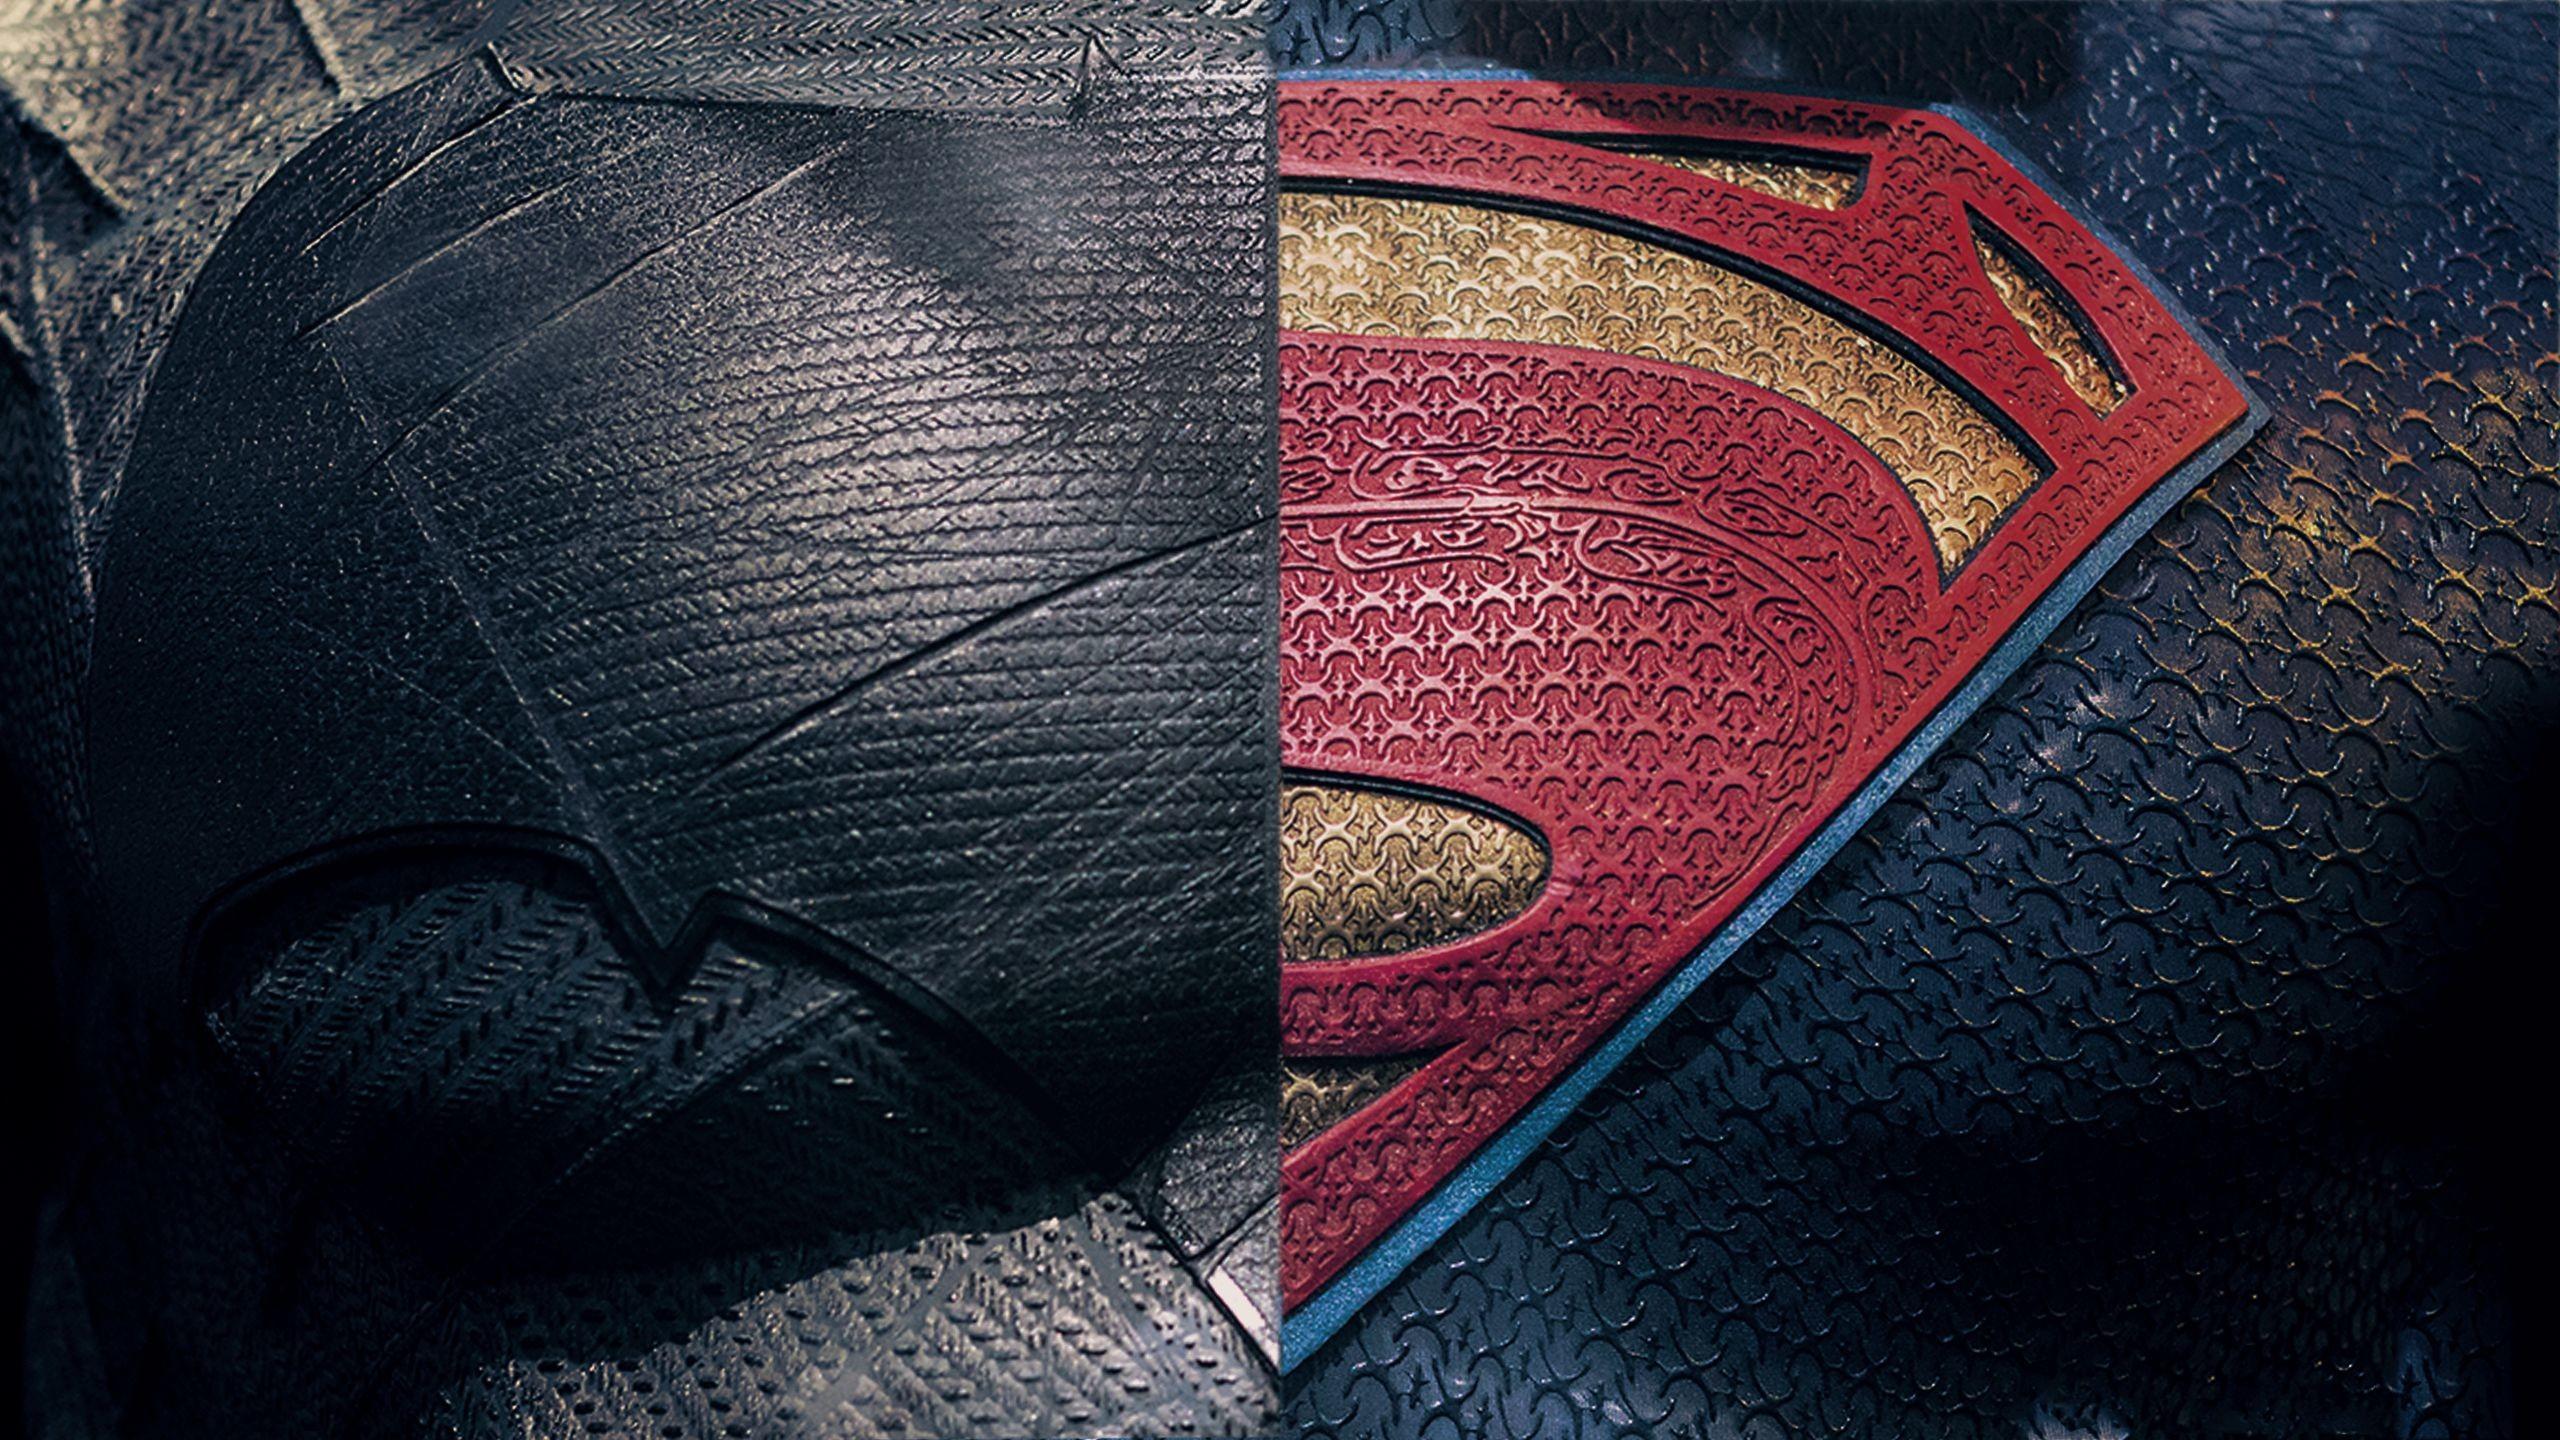 Download Man Of Steel Superman Between The Ruins Wallpaper - Hd Wallpapers Batman Vs Superman - HD Wallpaper